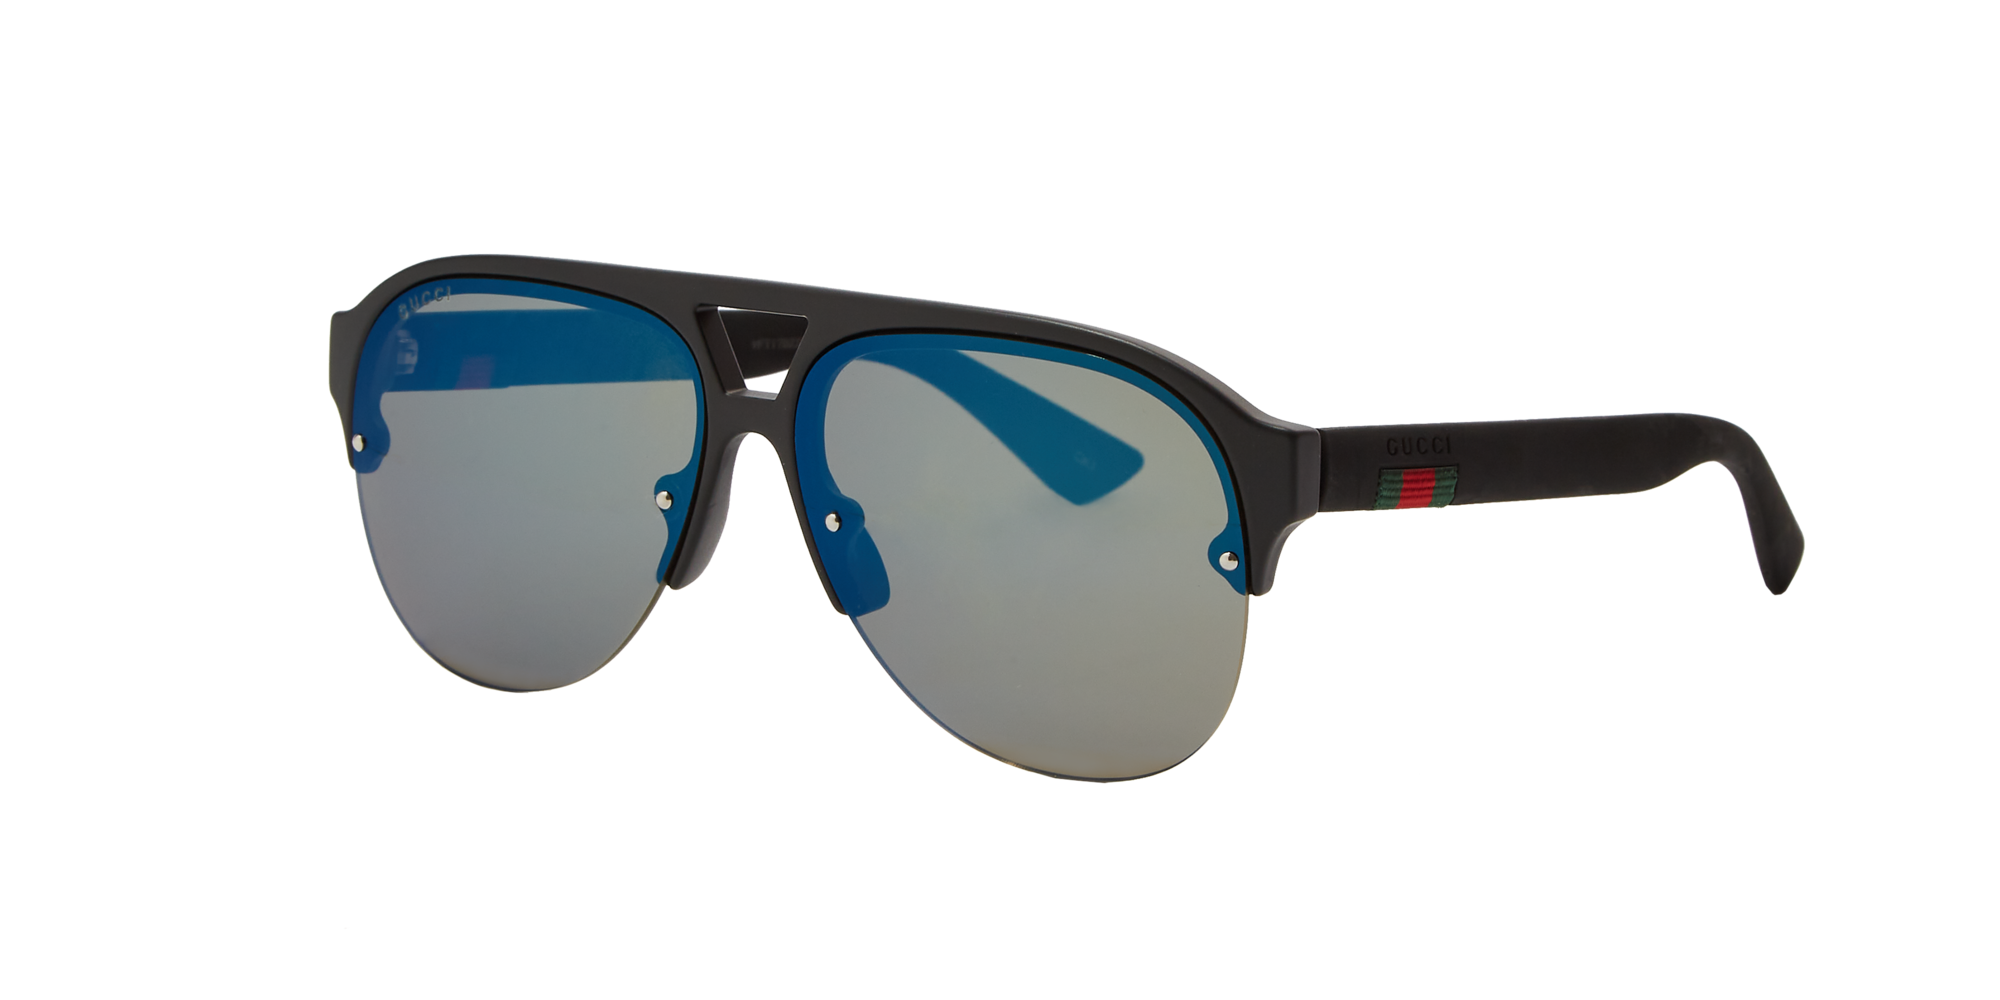 Gucci Man  GG0170S -  Frame color  Black, Lens color  Blue, Size 59-13 145